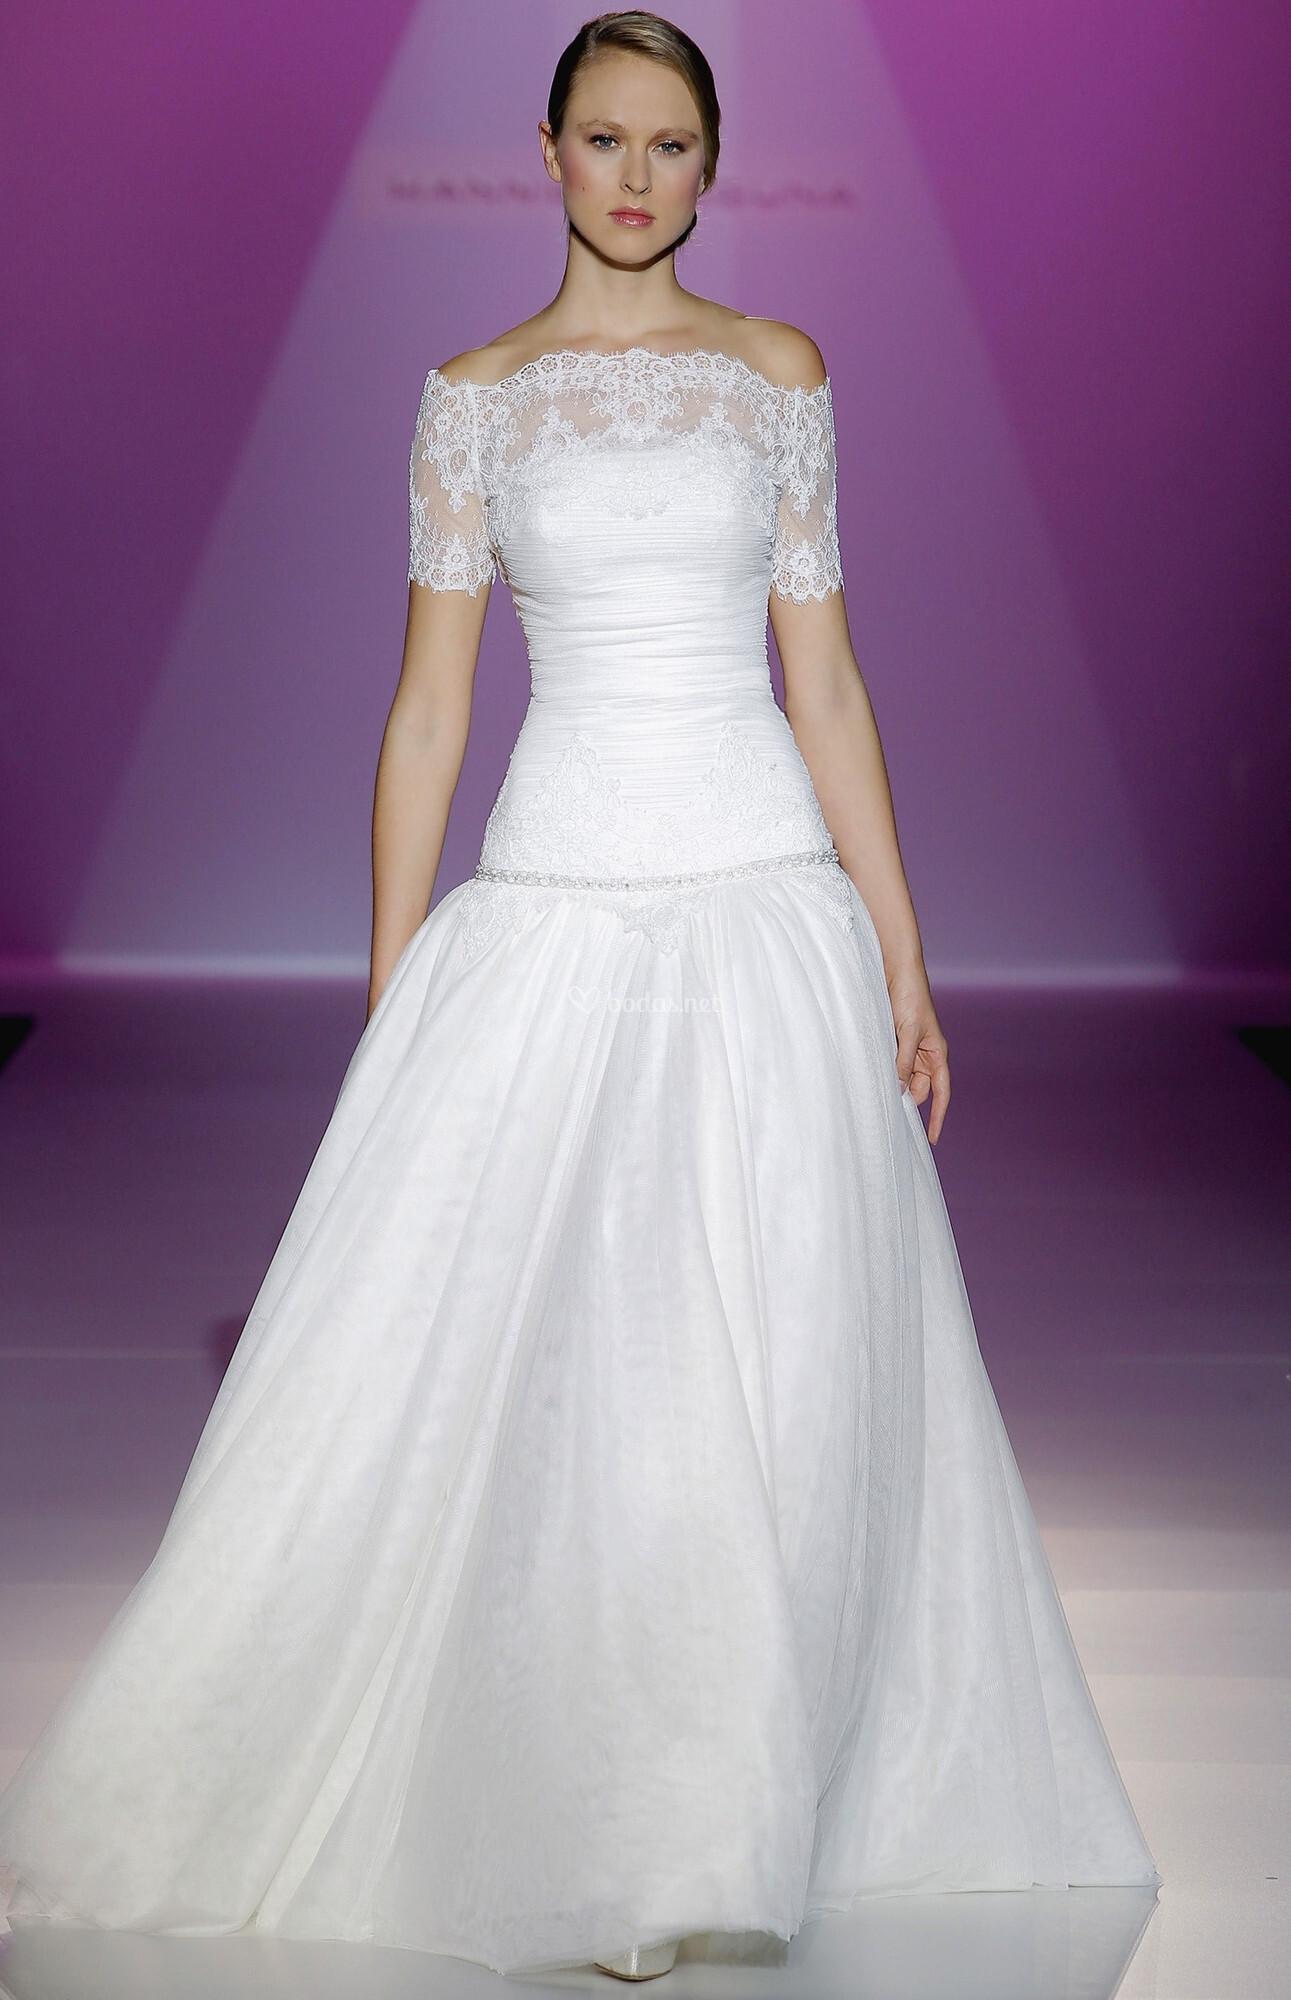 Bonito Vestido De Novia De Escote De La Reina Ana Modelo - Ideas de ...